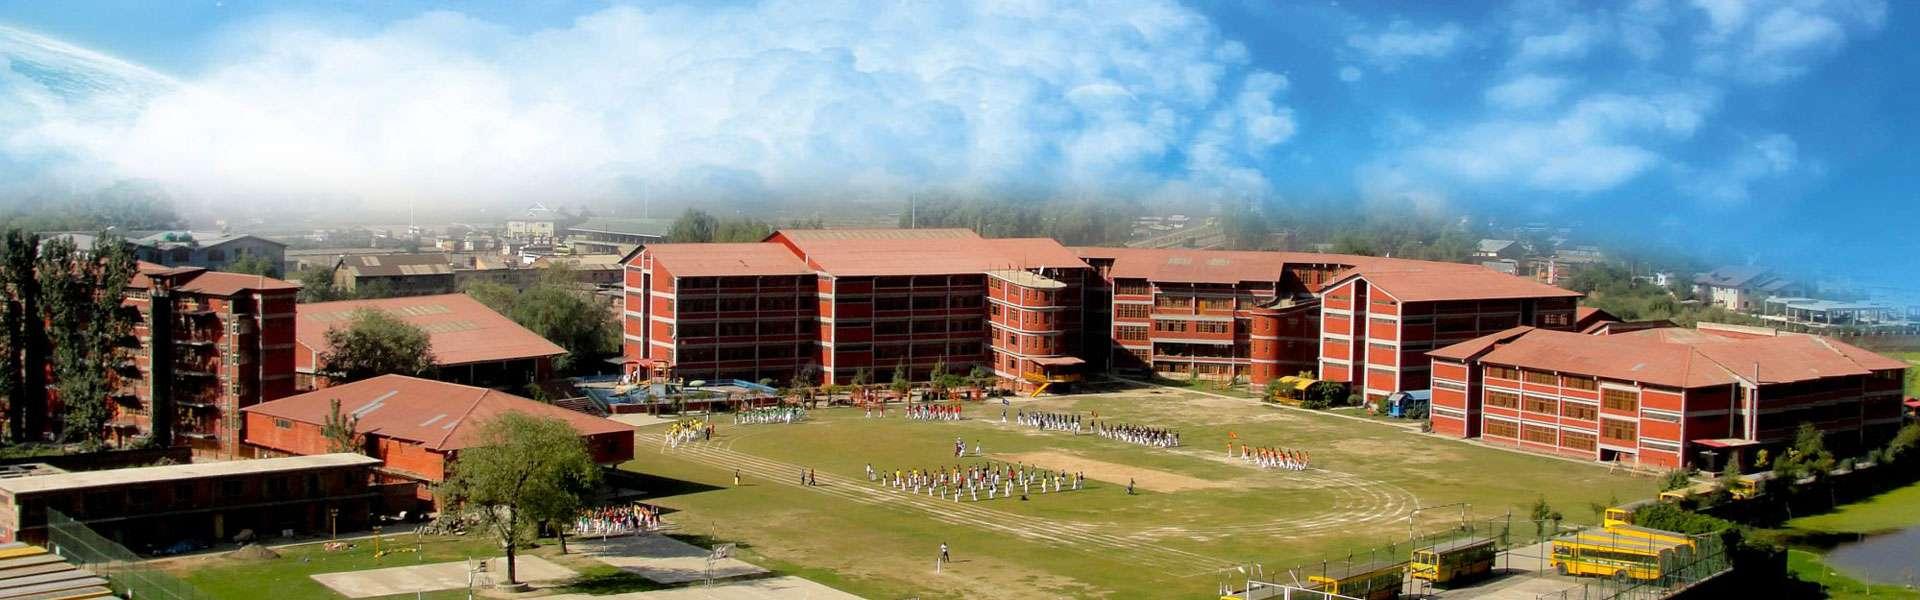 DELHI PUBLIC SCHOOL ATHWAJAN BYE PASS CHOWK SRINAGAR JAMMU amp KASHMIR 730029